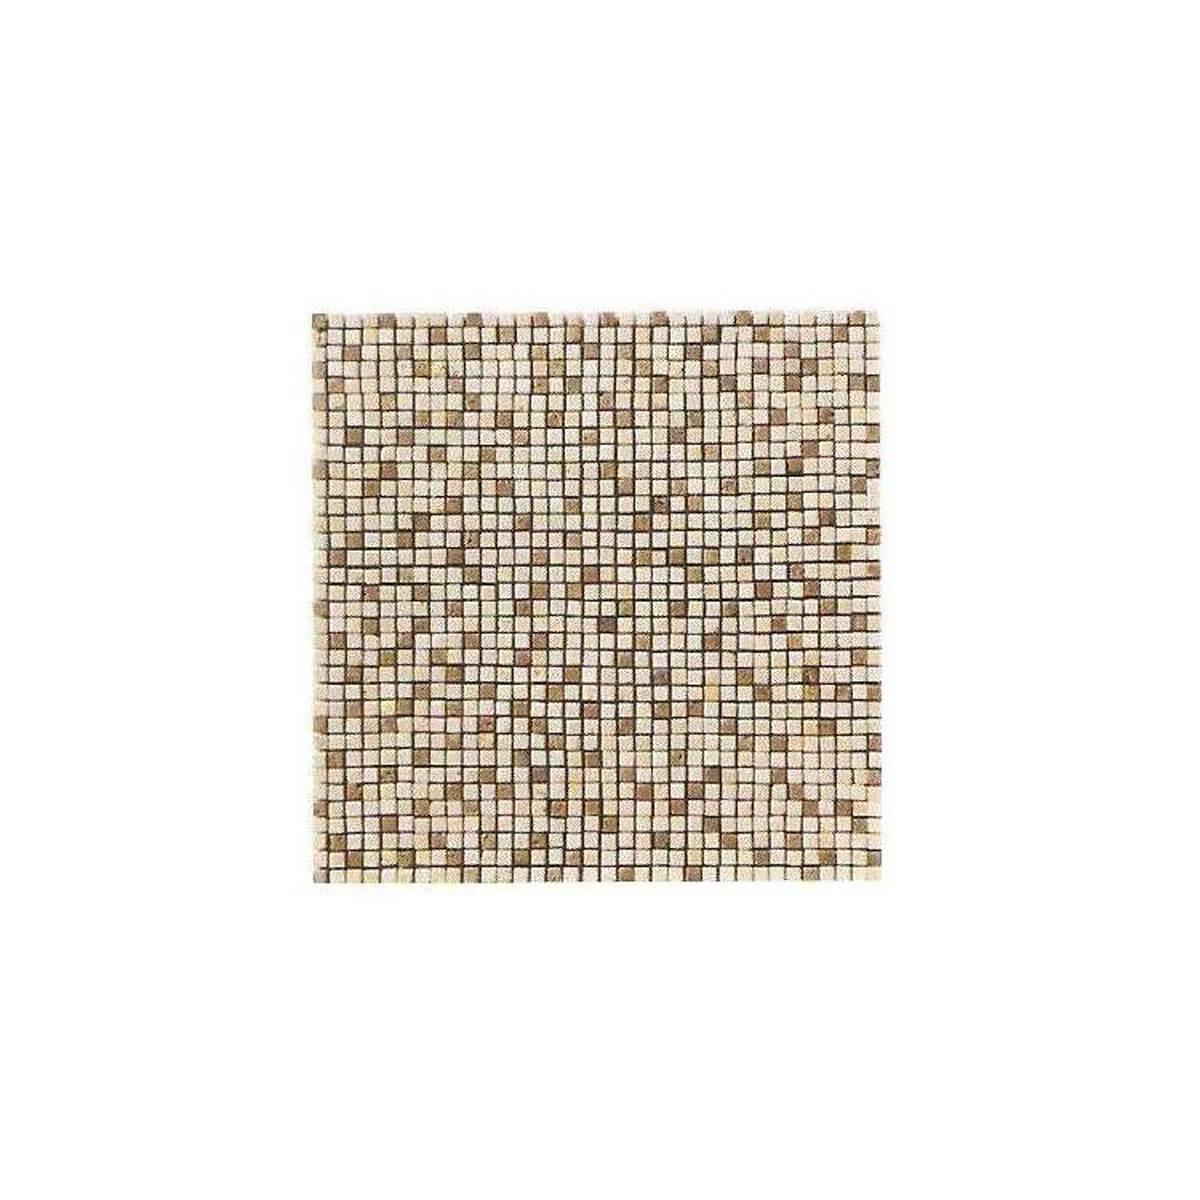 Mosaico micro travertino